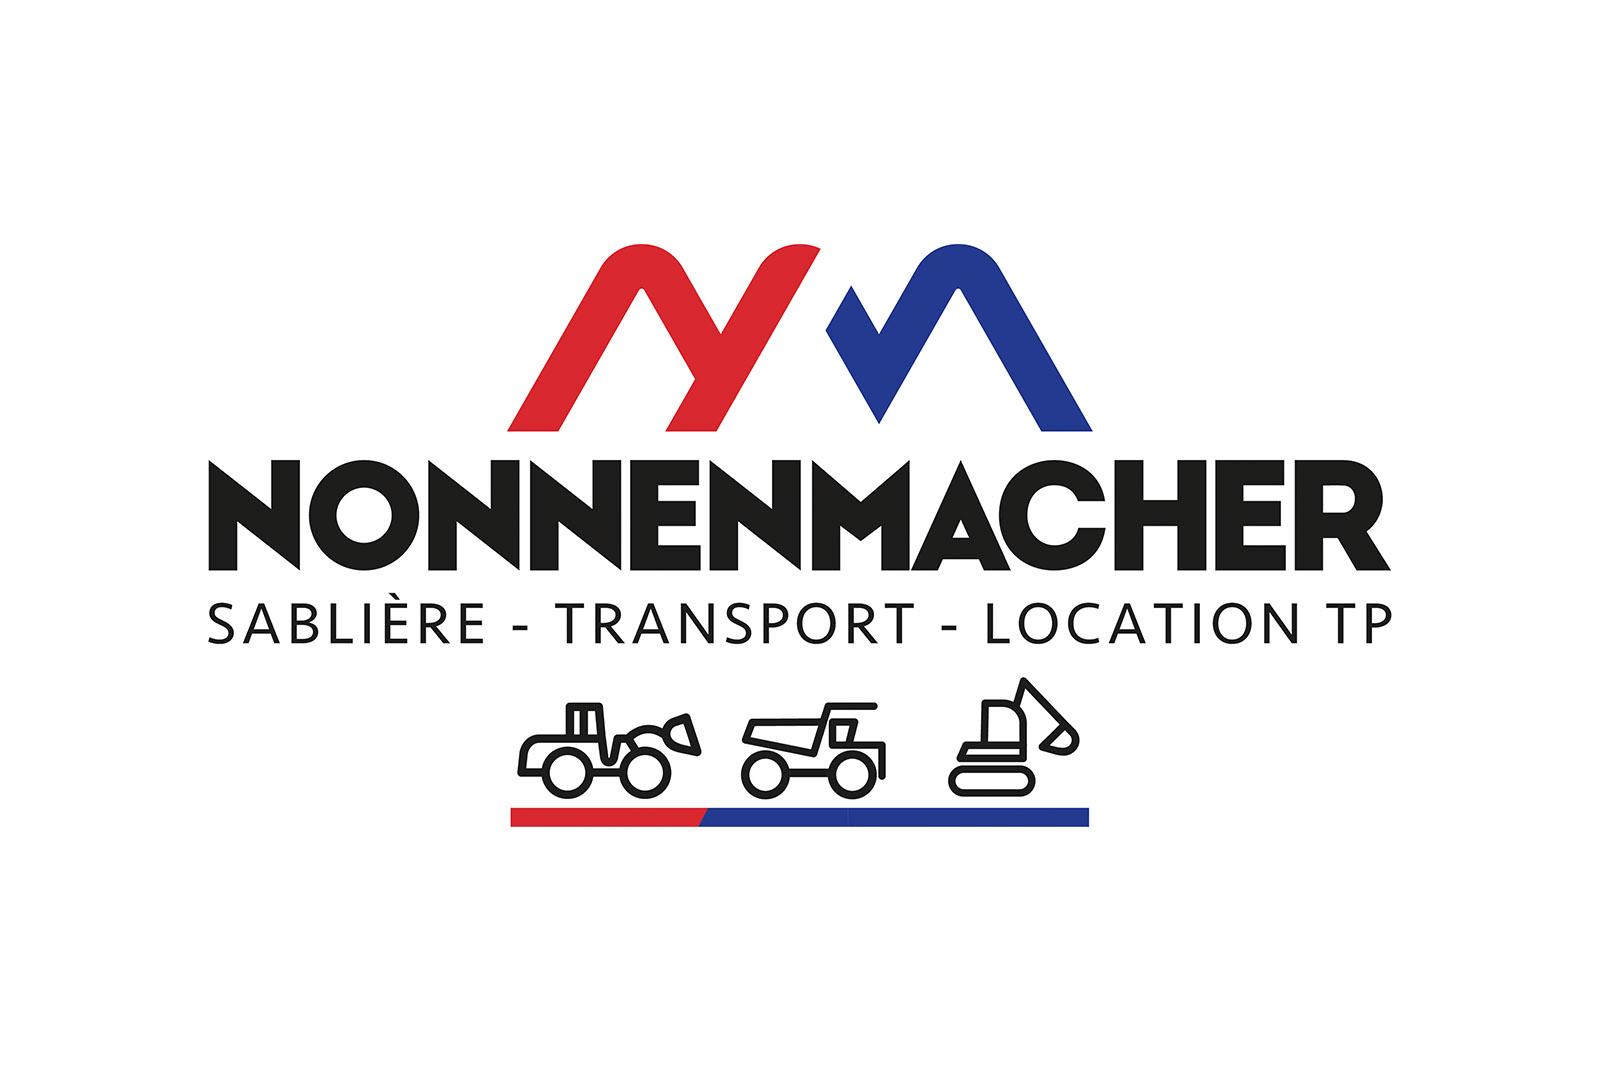 NONNENMACHER_IDENTITE_logo